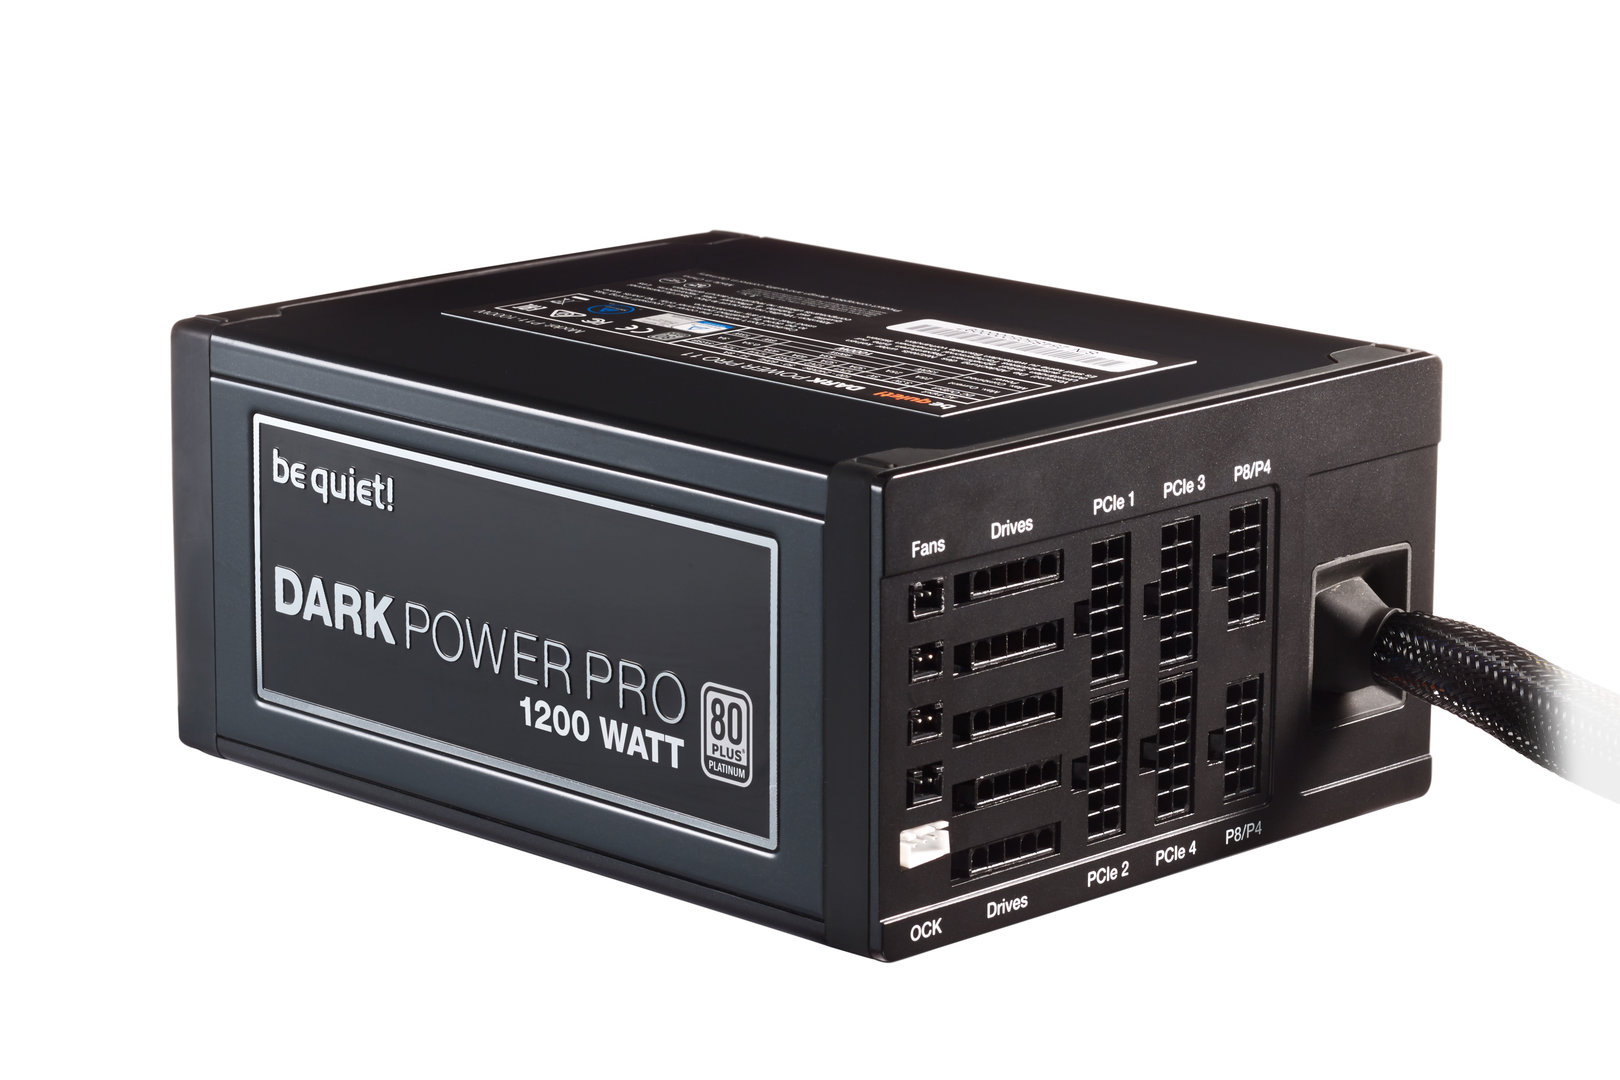 be quiet! Dark Power Pro P11